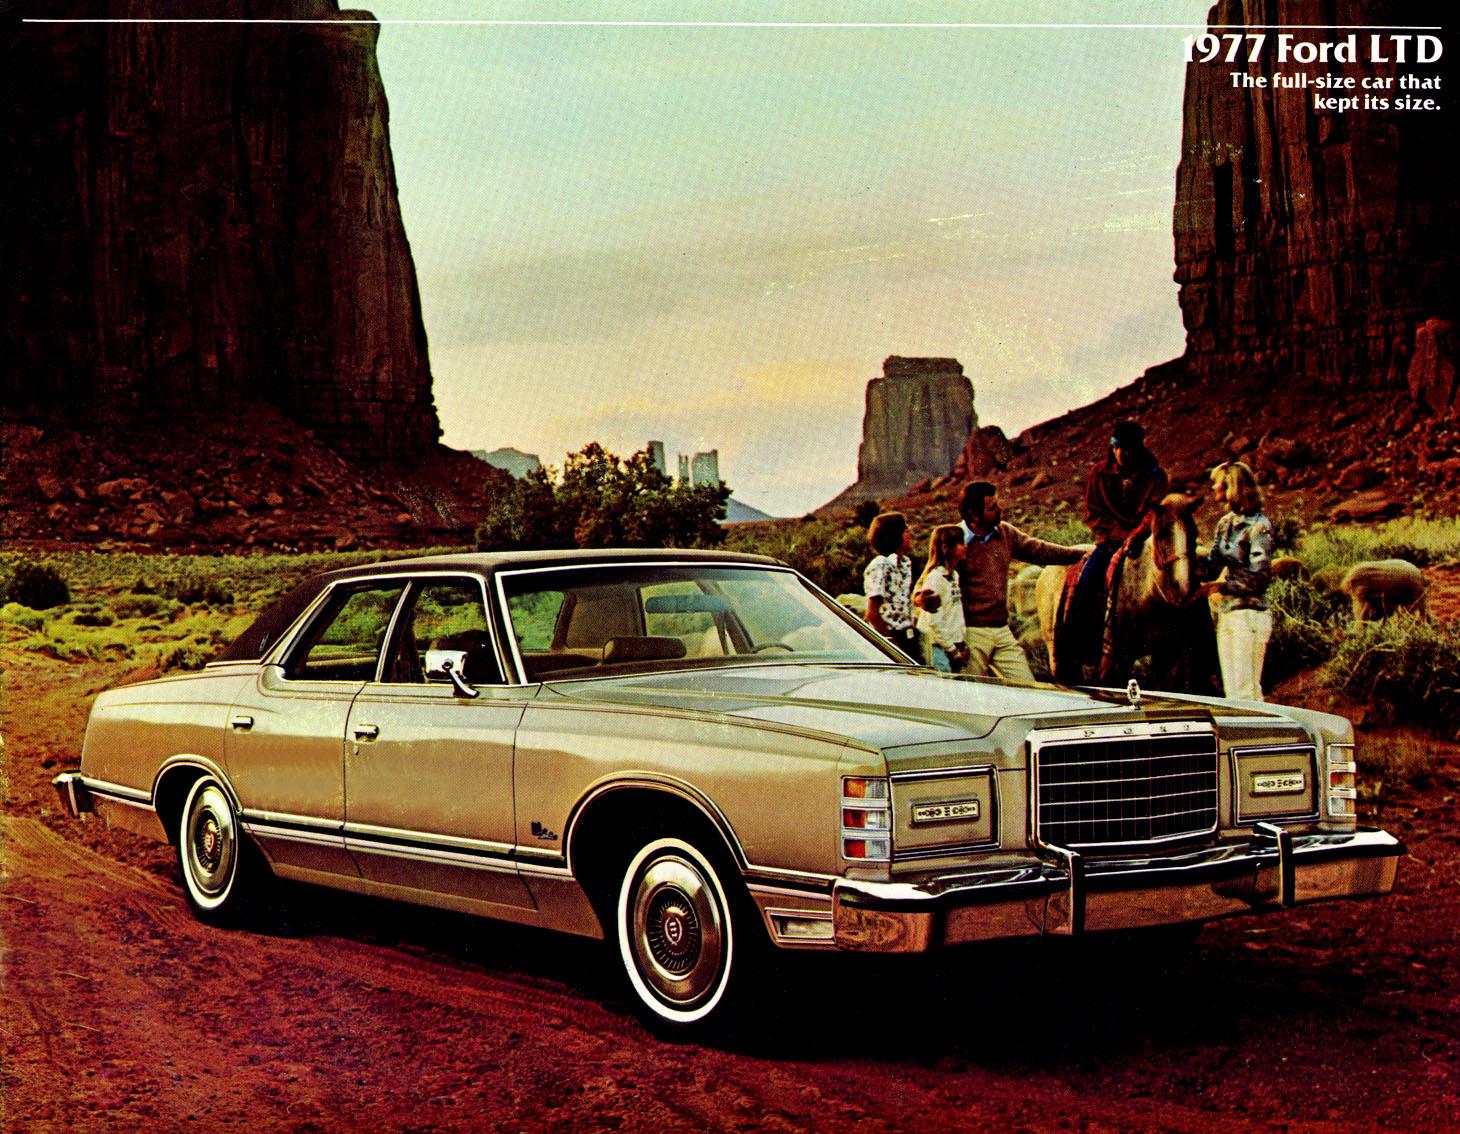 1977 Ford LTD Landau Sedan